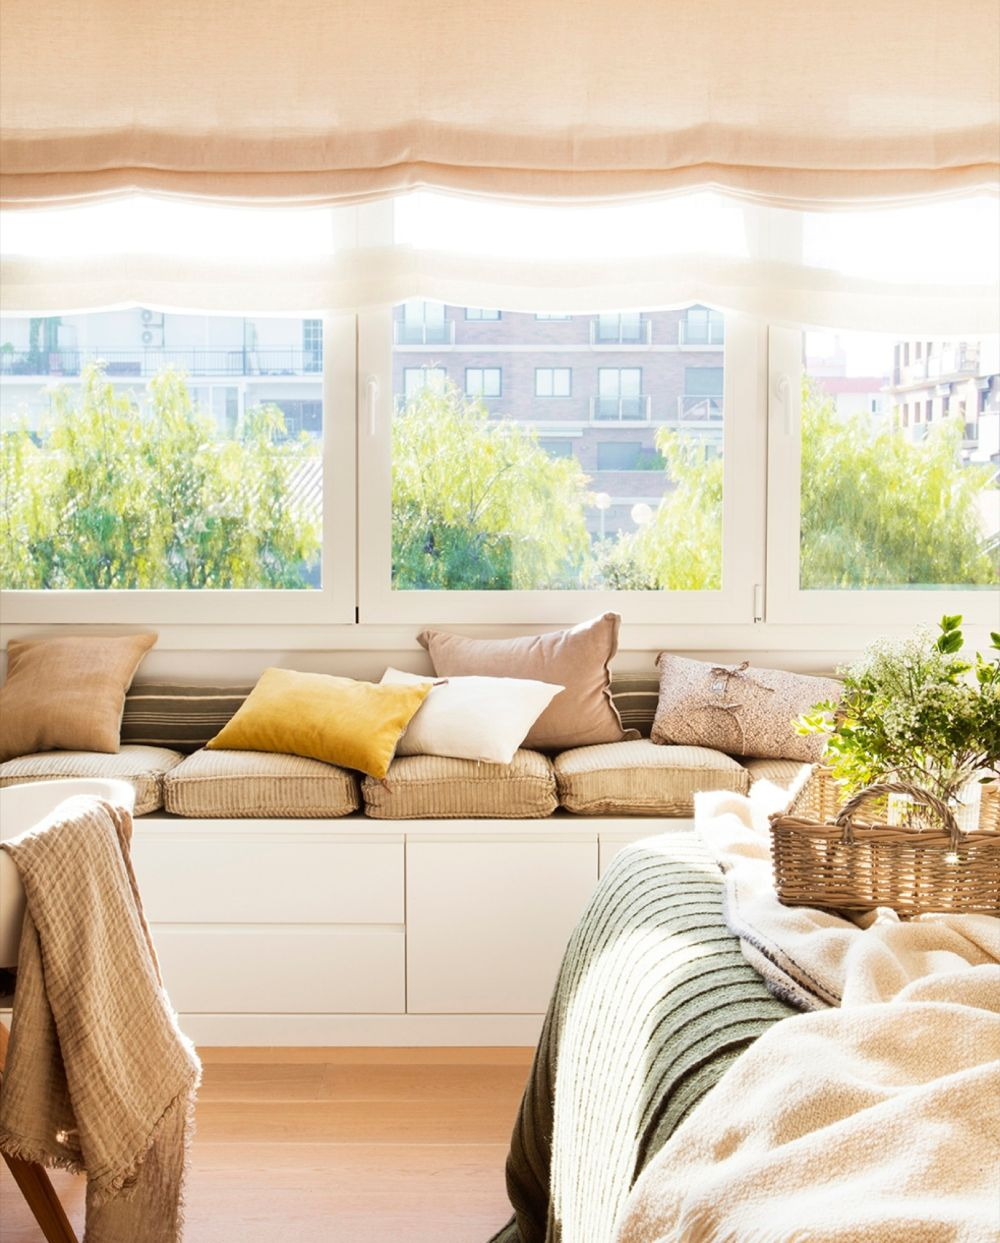 adelaparvu-com-despre-apartament-cald-in-tonuri-neutre-locuinta-spania-design-interior-laura-argelich-si-carla-casanova-foto-jordi-canosa-elmueble-11